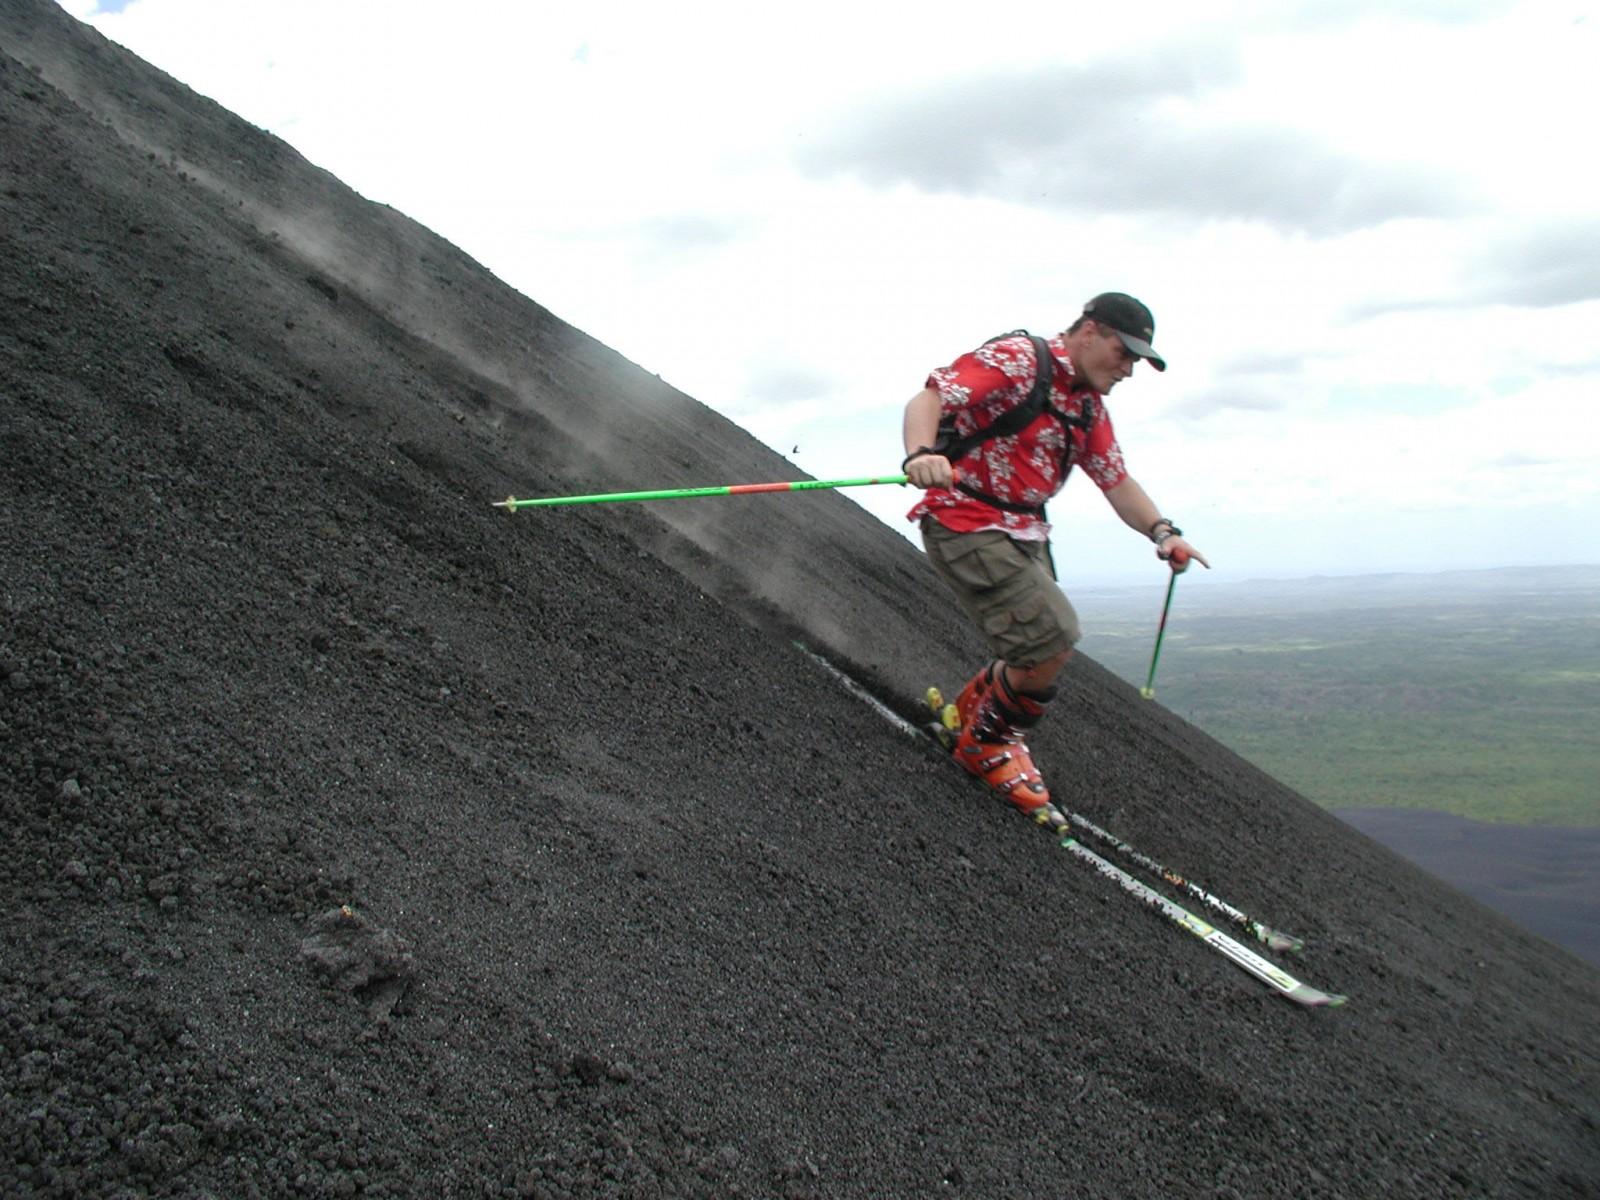 Cerro Negro Volcano, Sandboarding, Leon, Nicaragua, Pixabay.com